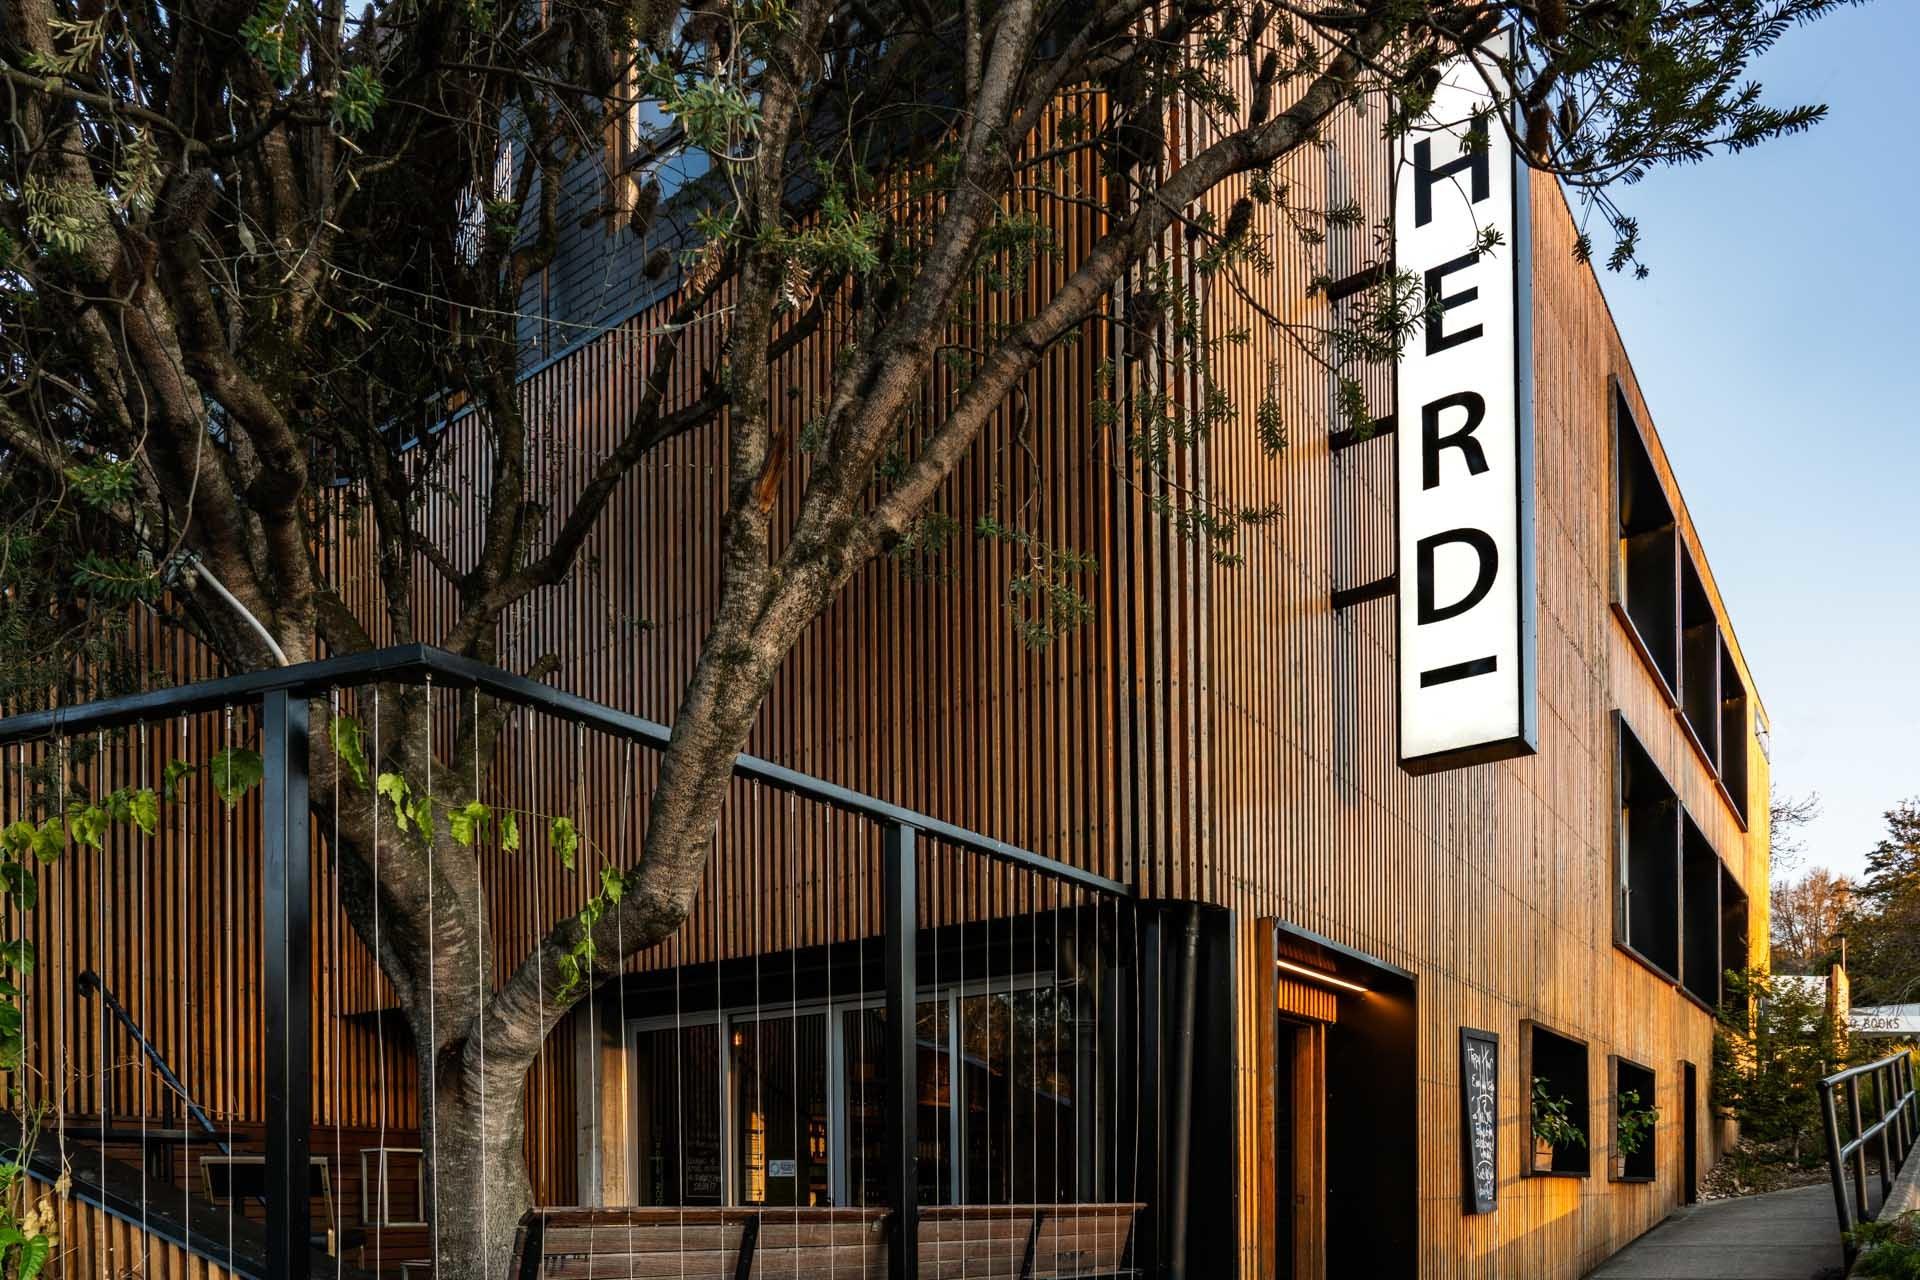 j - Herd Bar & Grill